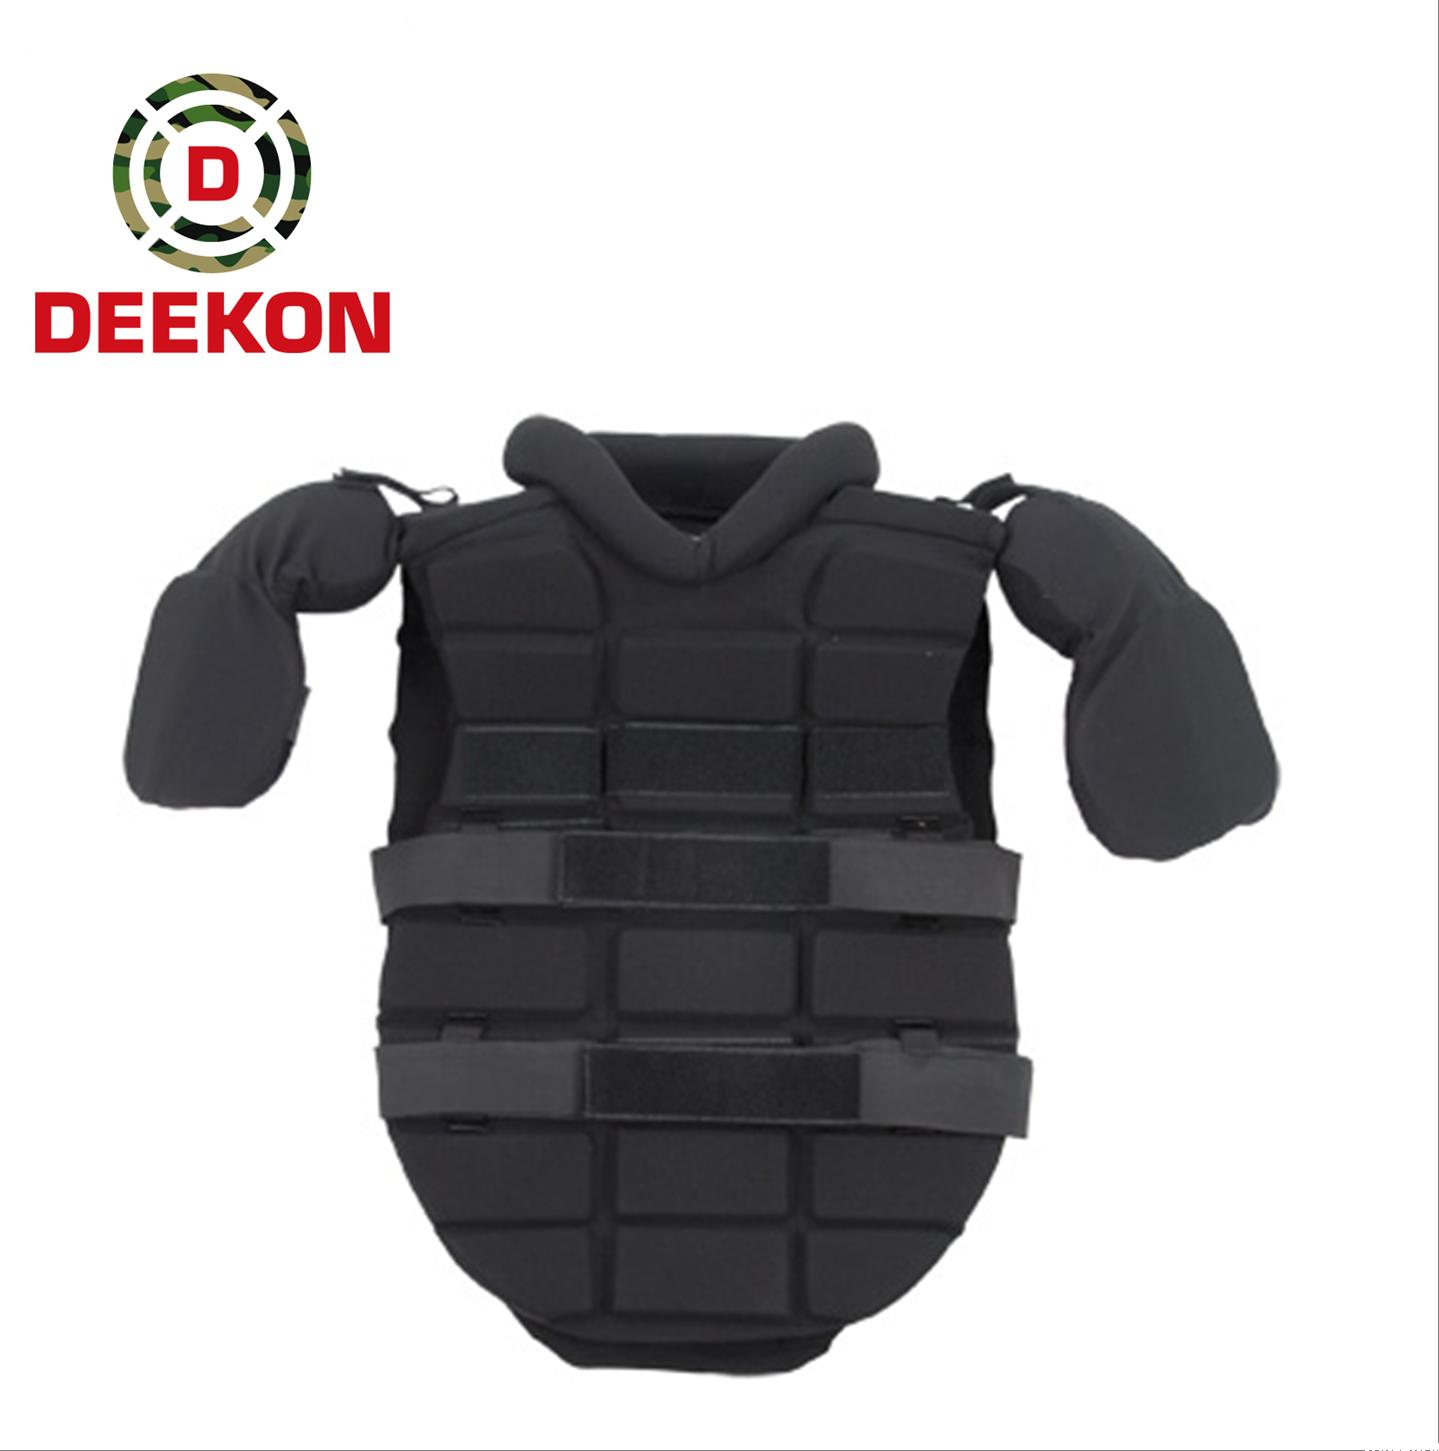 https://www.deekongroup.com/img/police-officer-suit.png